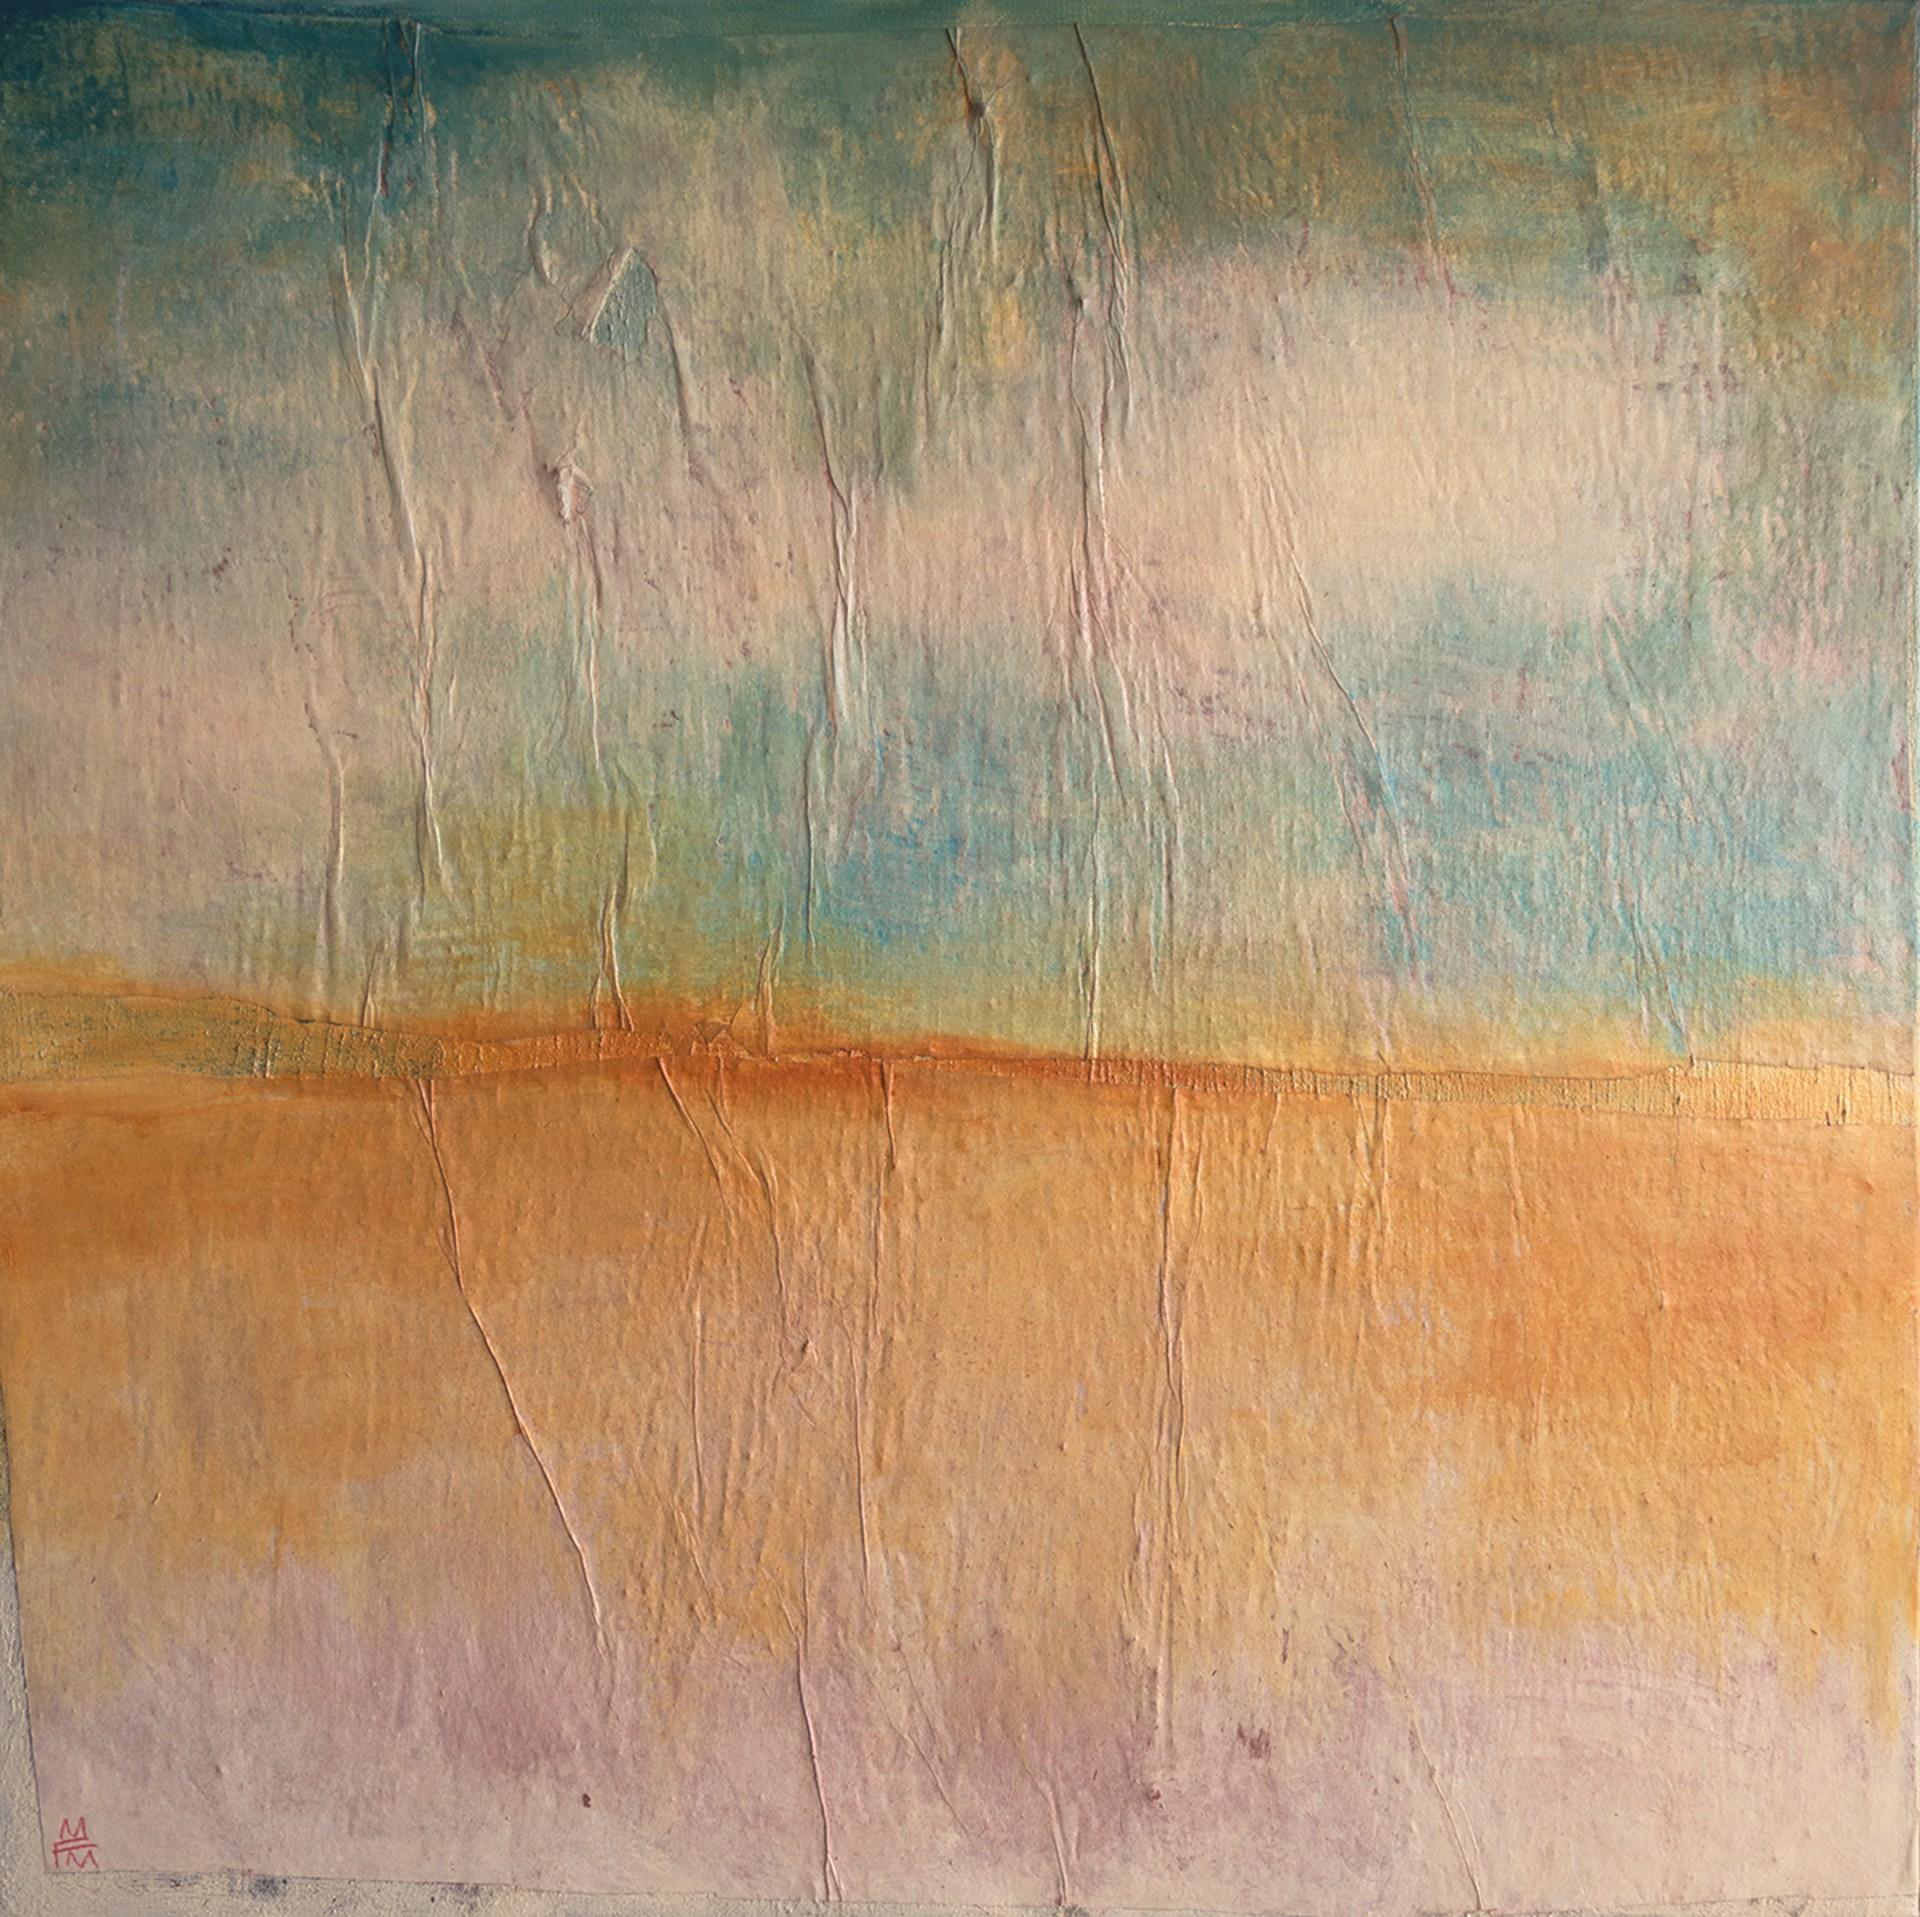 New Horizon by Matti Freeman